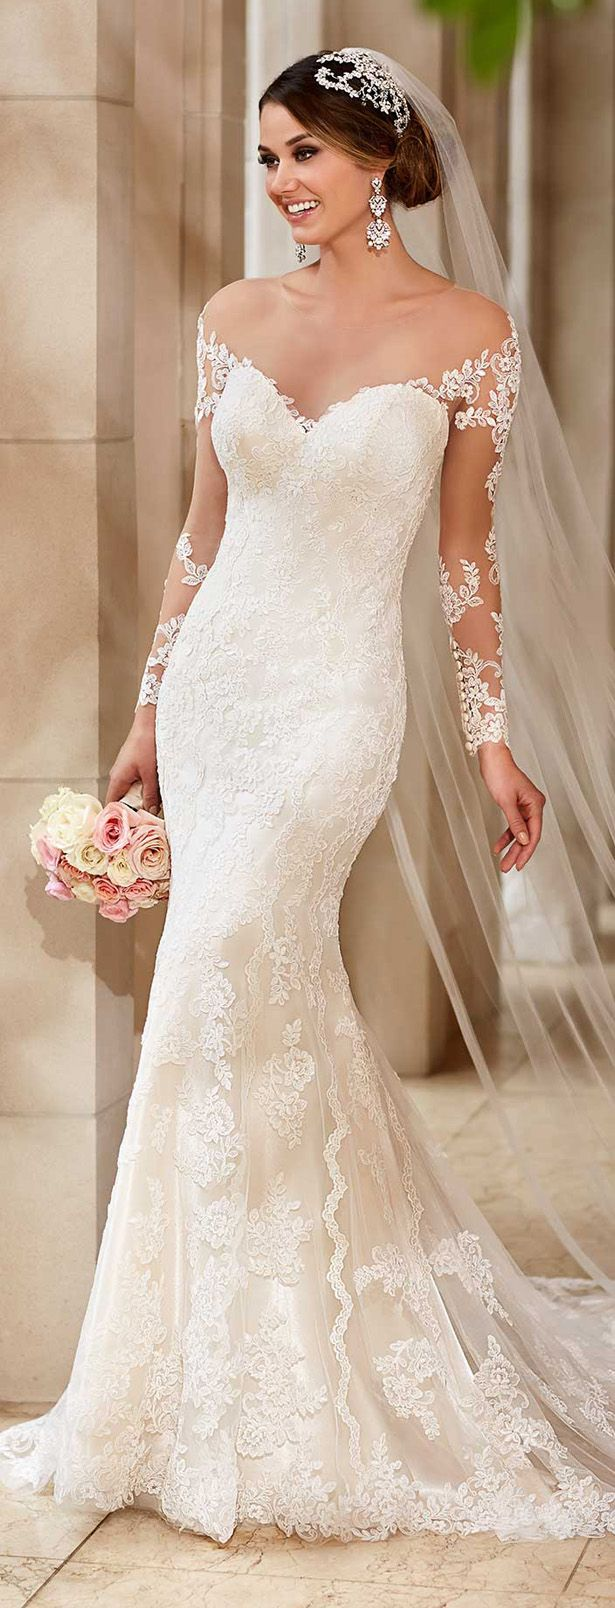 stella stella wedding dressing Stella York Spring Wedding Dresses Collection http www tulleandchantilly